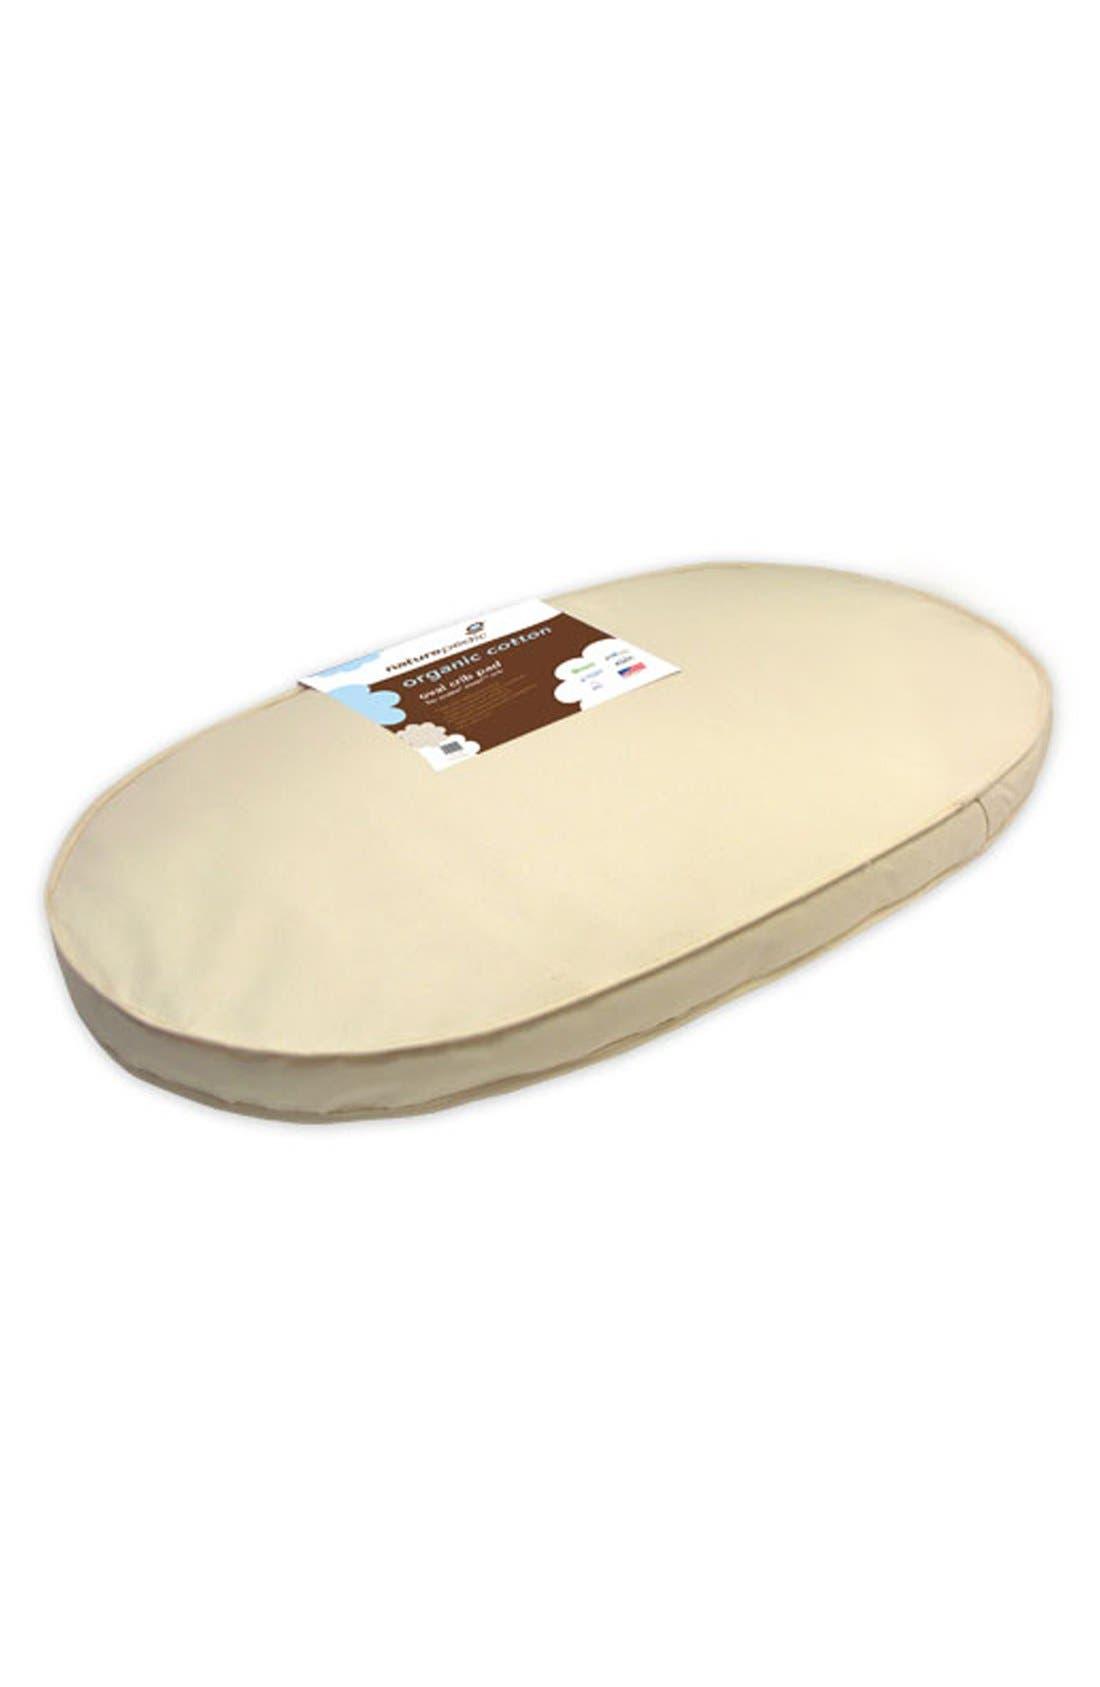 Organic Cotton Oval Crib Mattress for Stokke Sleepi Crib,                             Alternate thumbnail 2, color,                             NATURAL